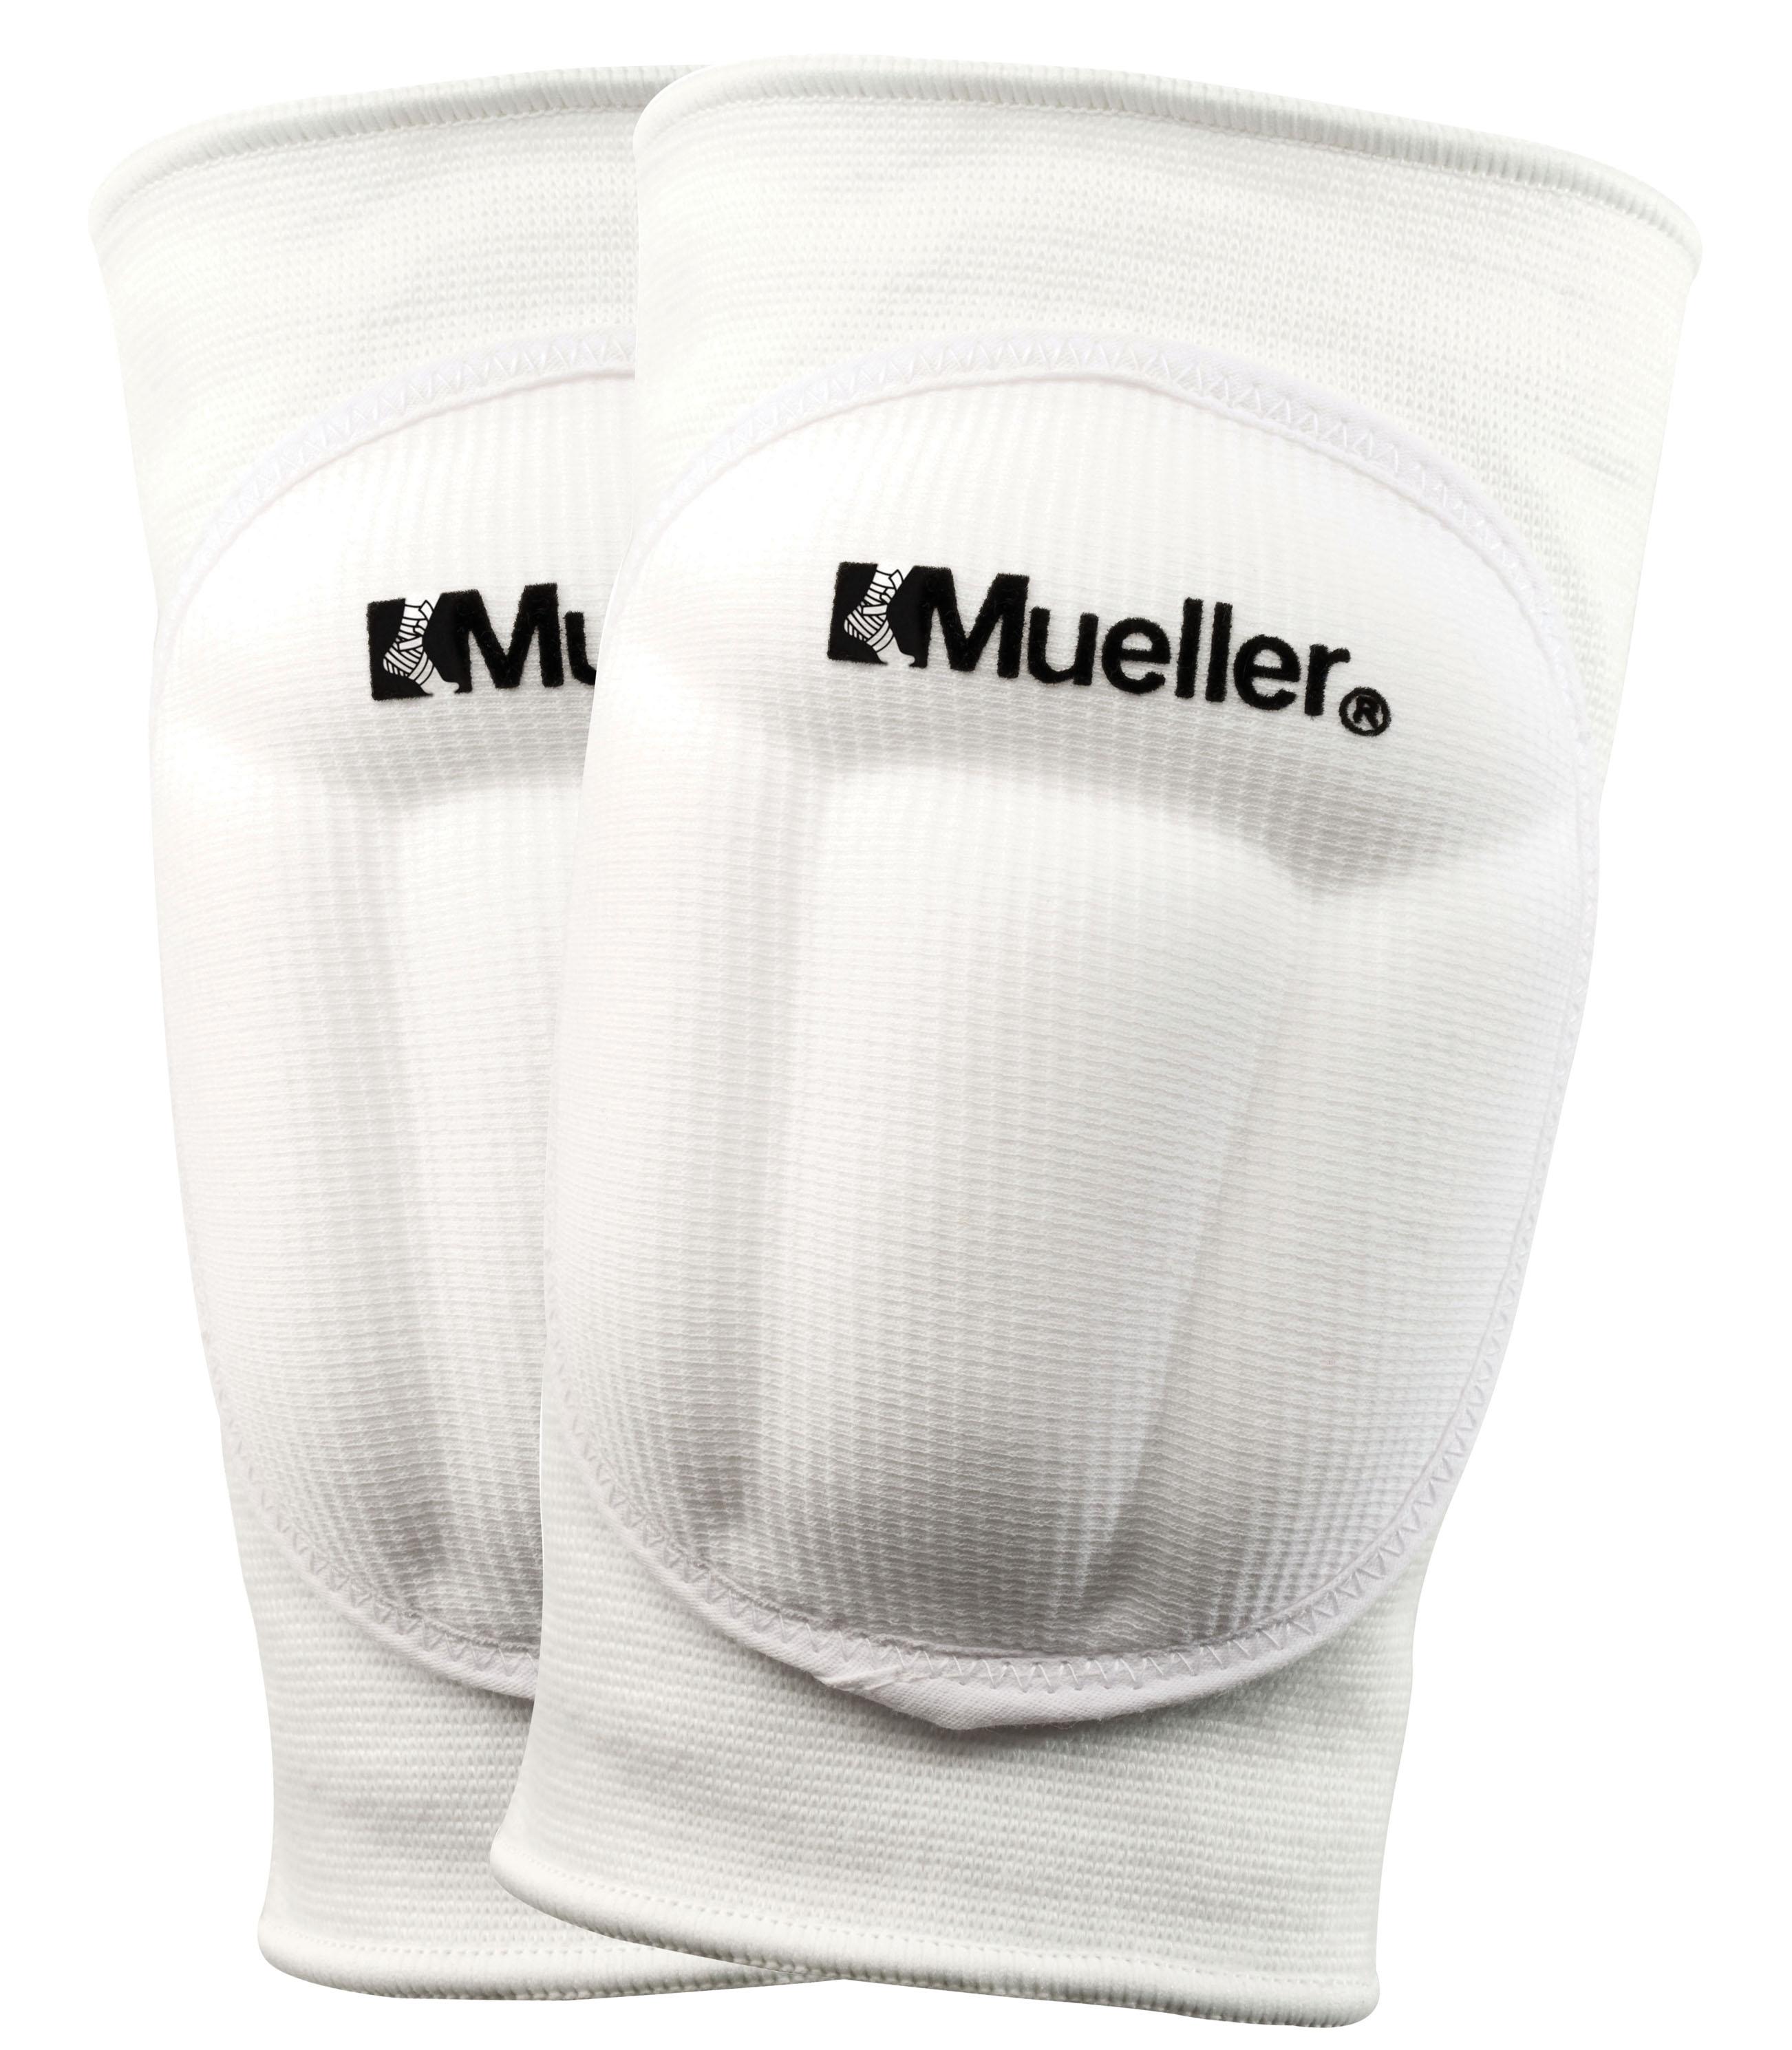 Mueller Sports Medicine Volleyball Knee Pads White Volleyball Knee Pads Volleyball Volleyball Gear